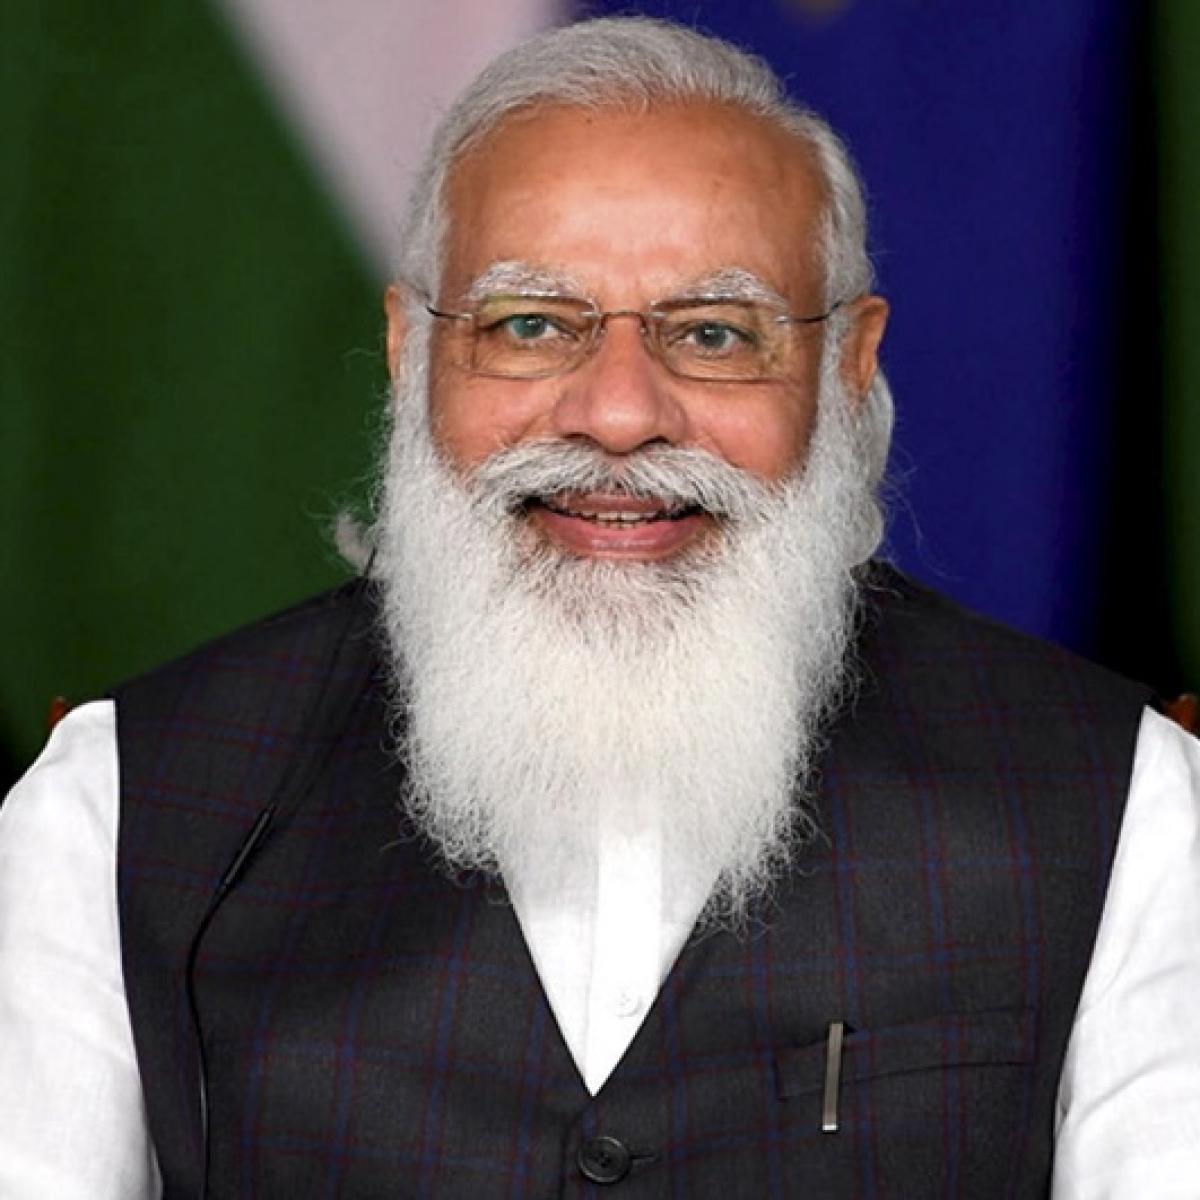 Stronger India, EU relationship crucial for ensuring rules-based, multi-polar order: PM Modi